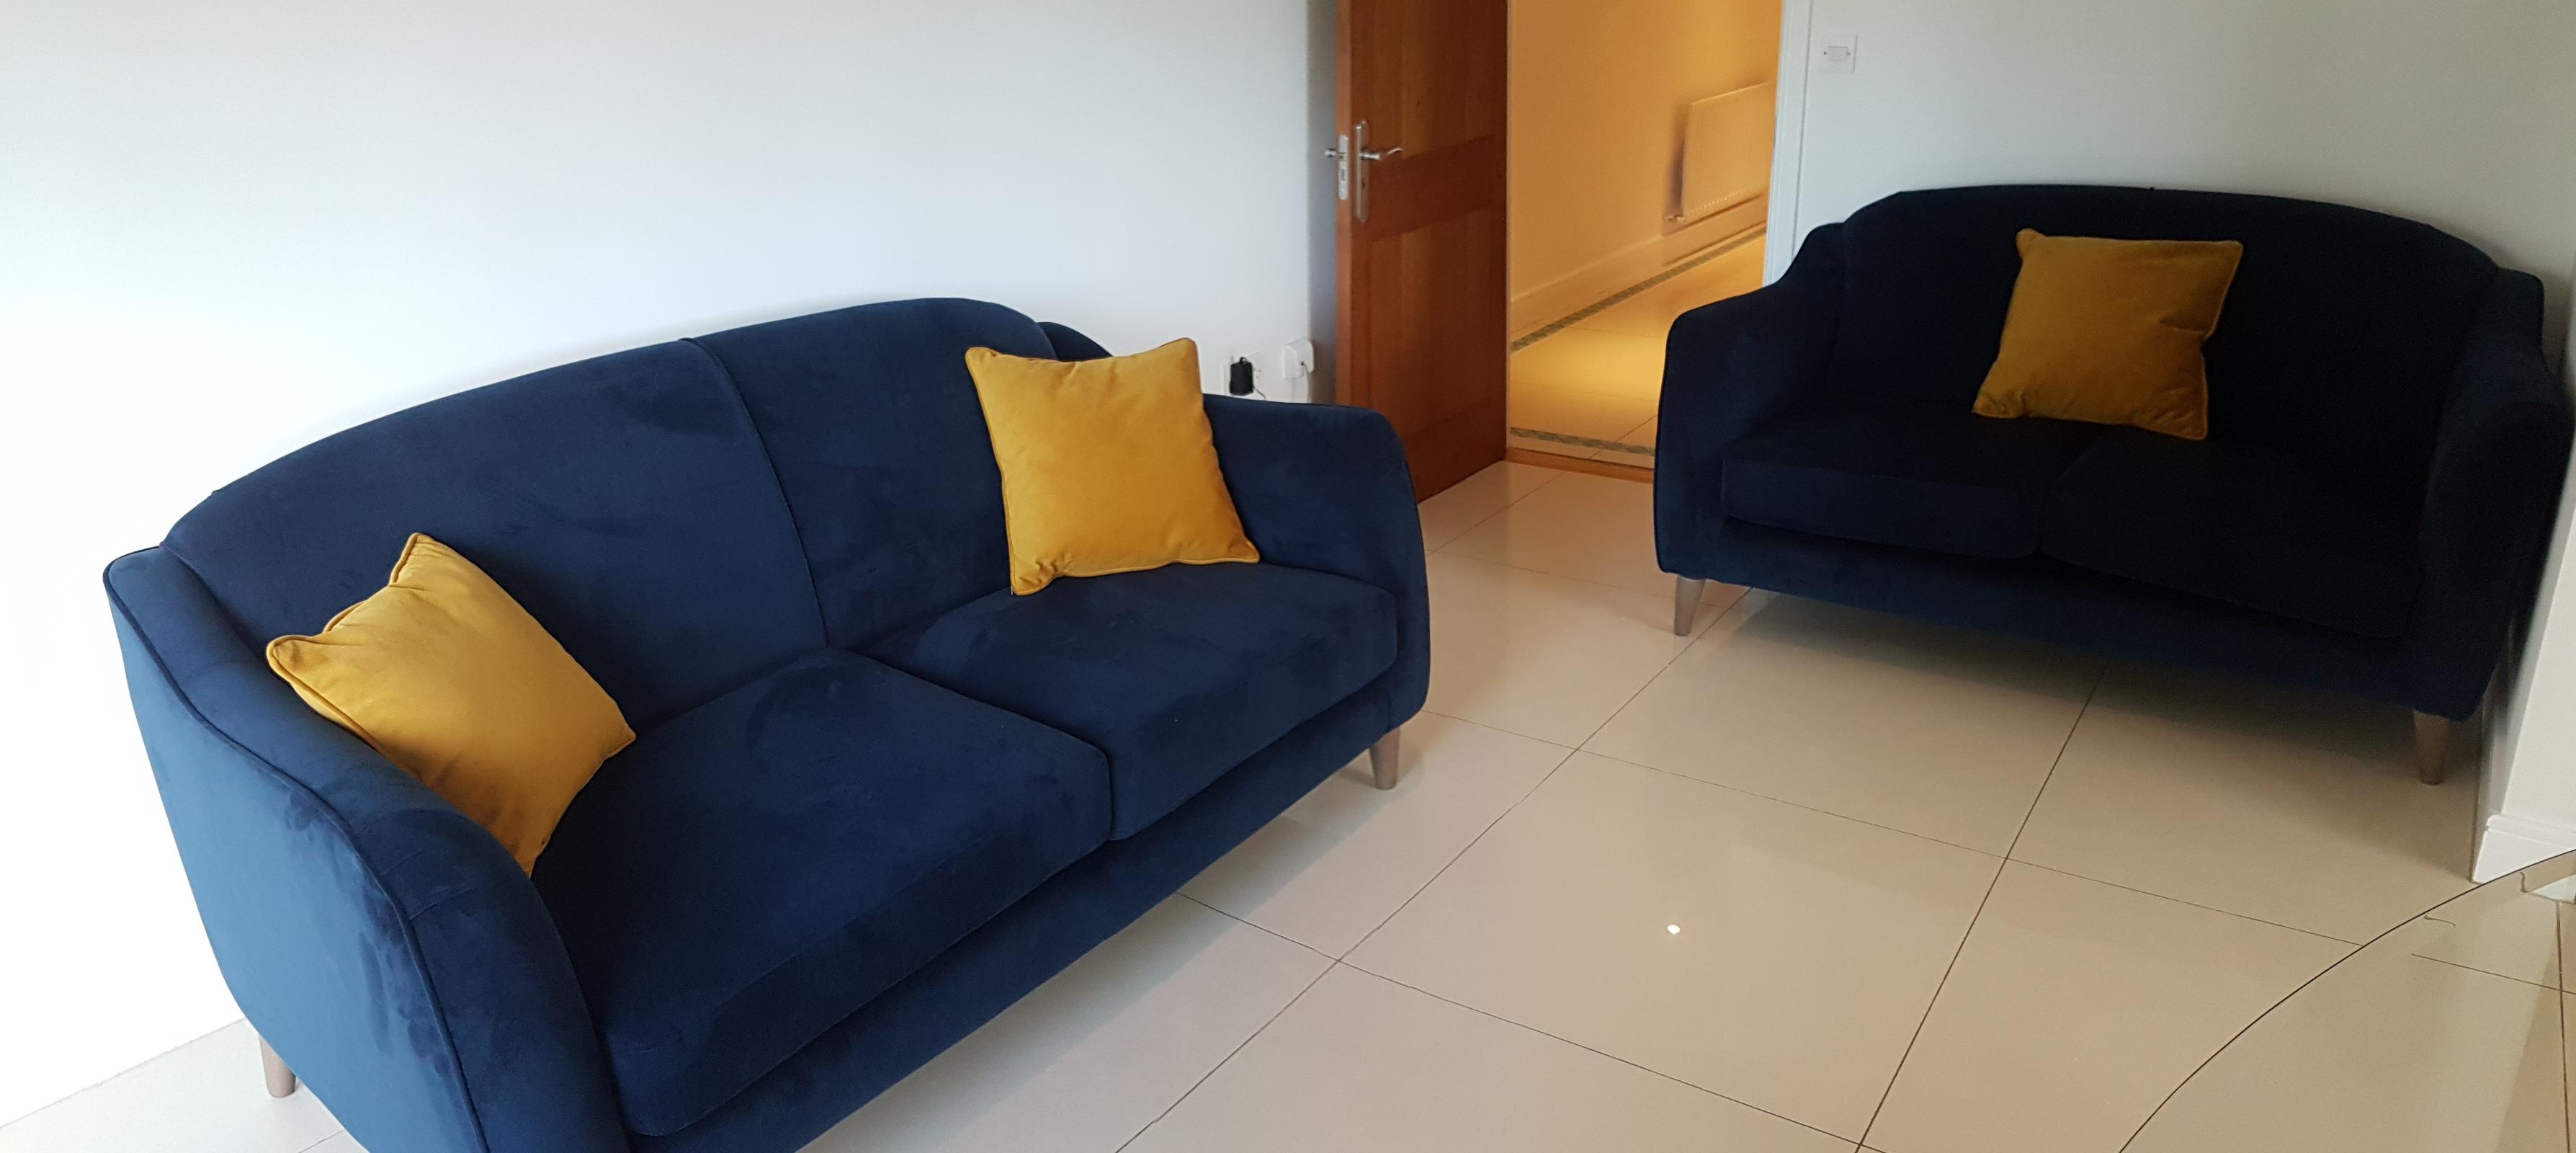 Apartment 192, Beechwood Court, Stillorgan, Co. Dublin